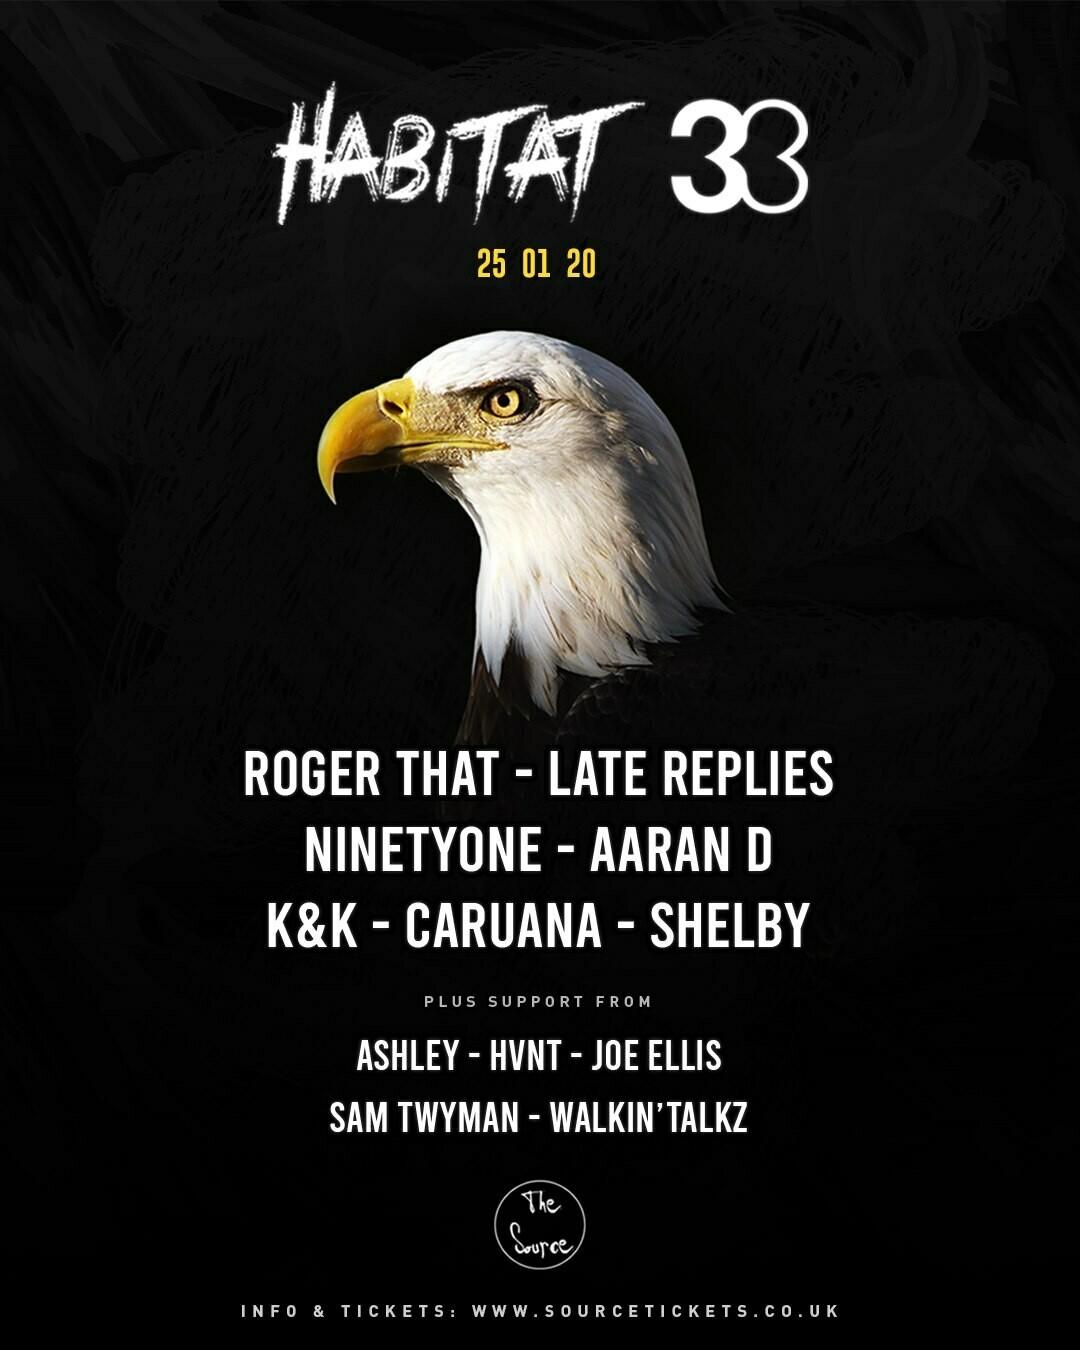 Saturday 25th January 2020 - Habitat x 33